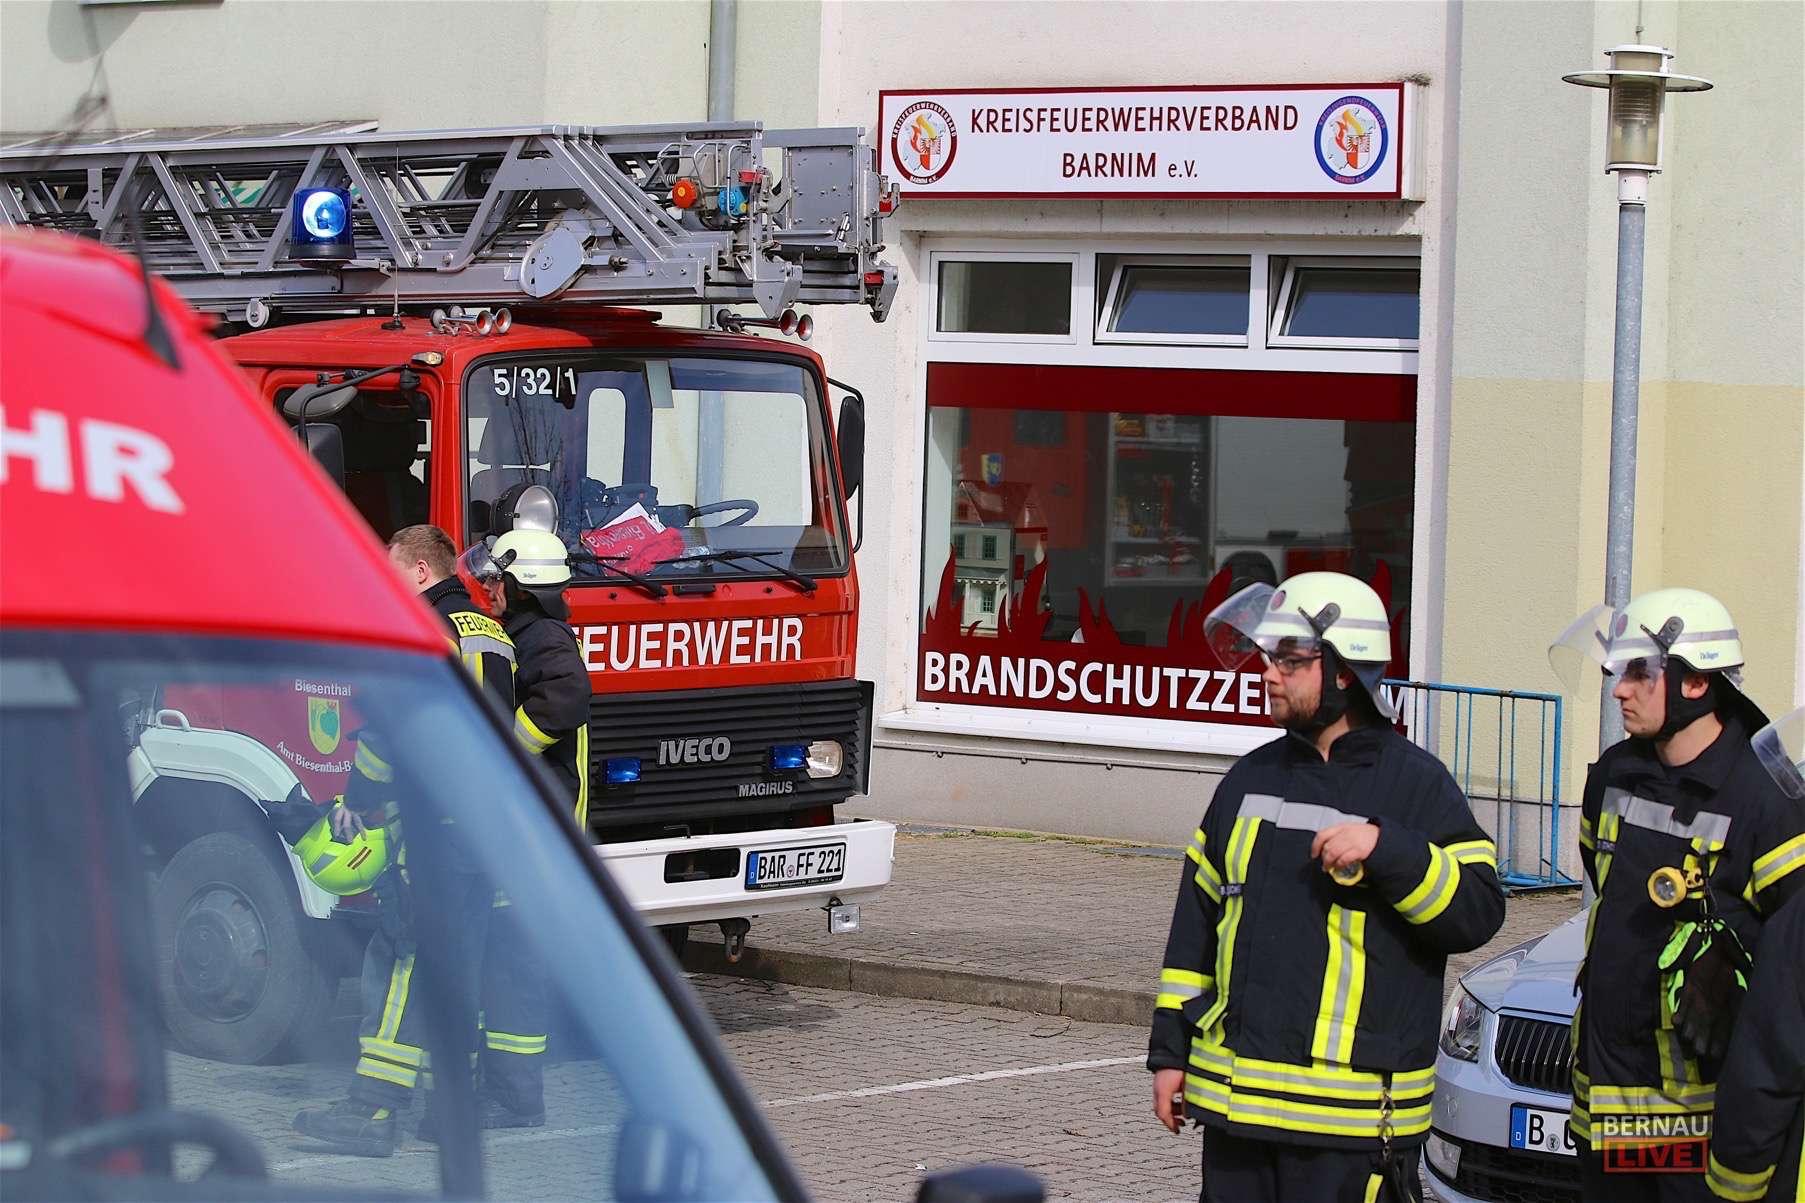 Biesenthal: Feuer beim Kreisfeuerwehrverband Barnim e.V.